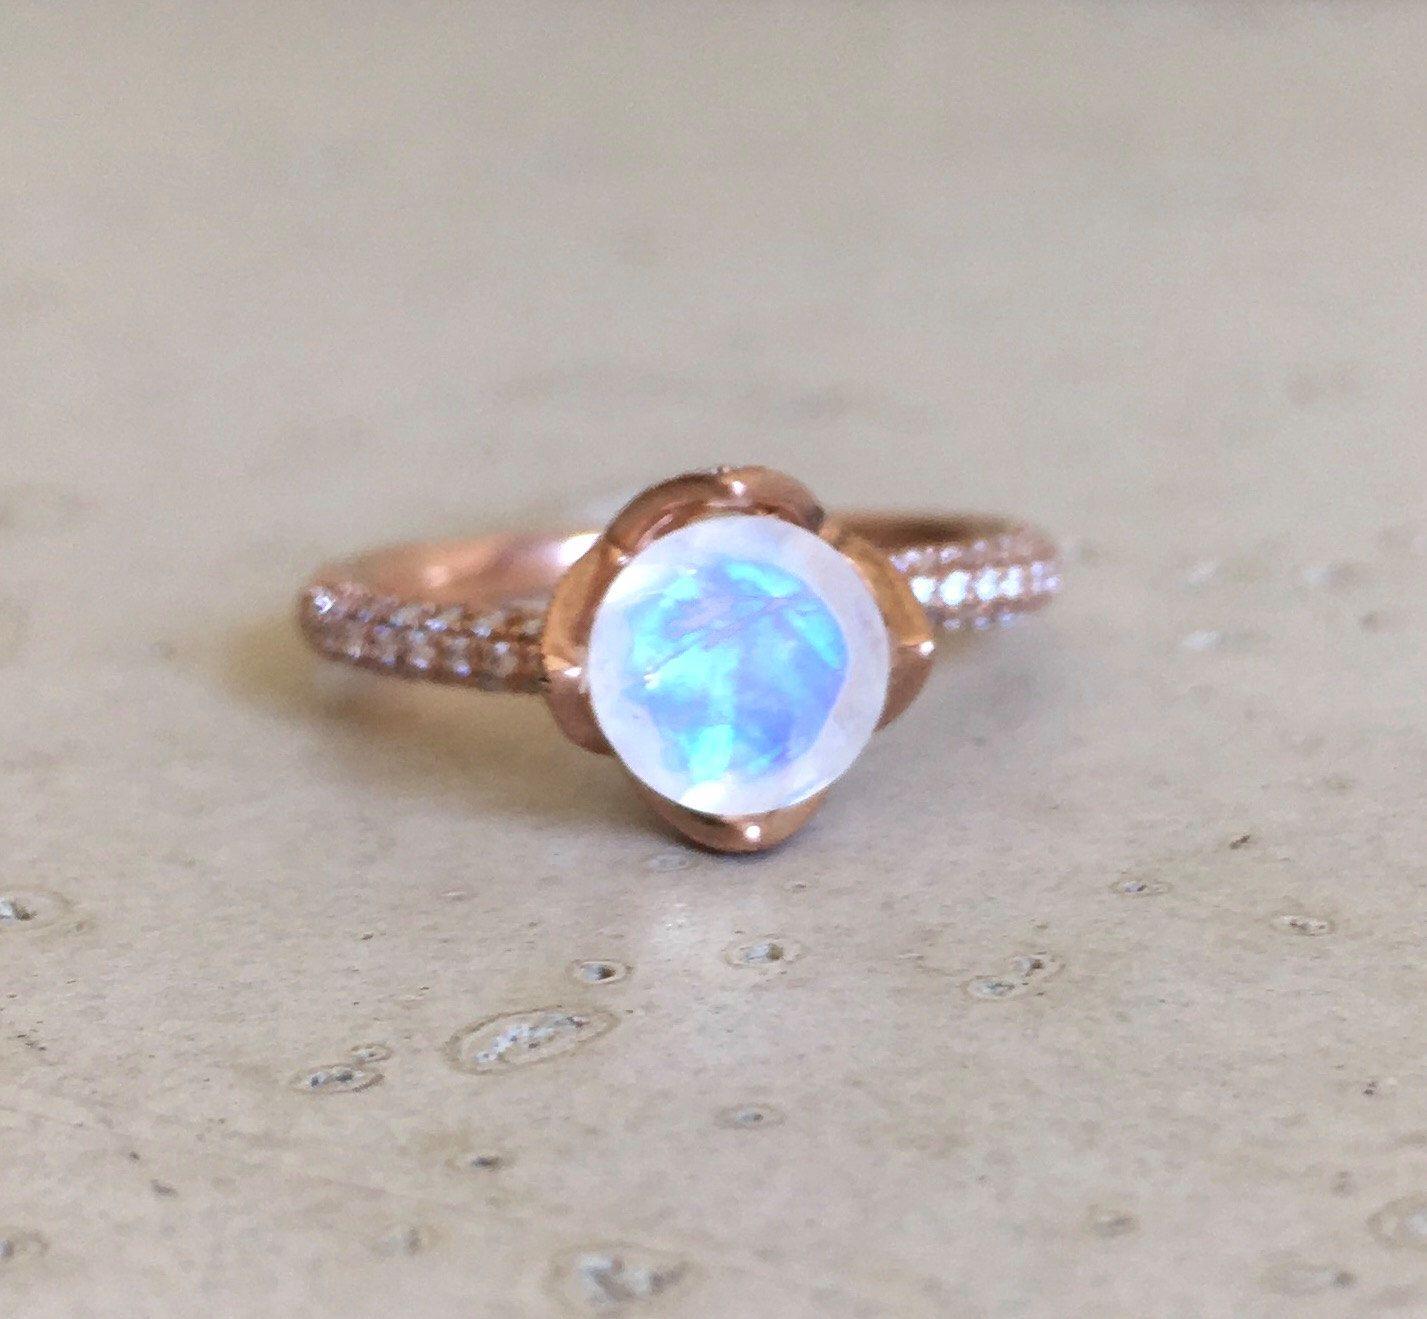 moonstone wedding rings Lotus Flower Moonstone Engagement Ring Rose Gold Moonstone Promise Ring Diamond Moonstone Bridal Ring Rose Gold Moonstone Wedding Ring